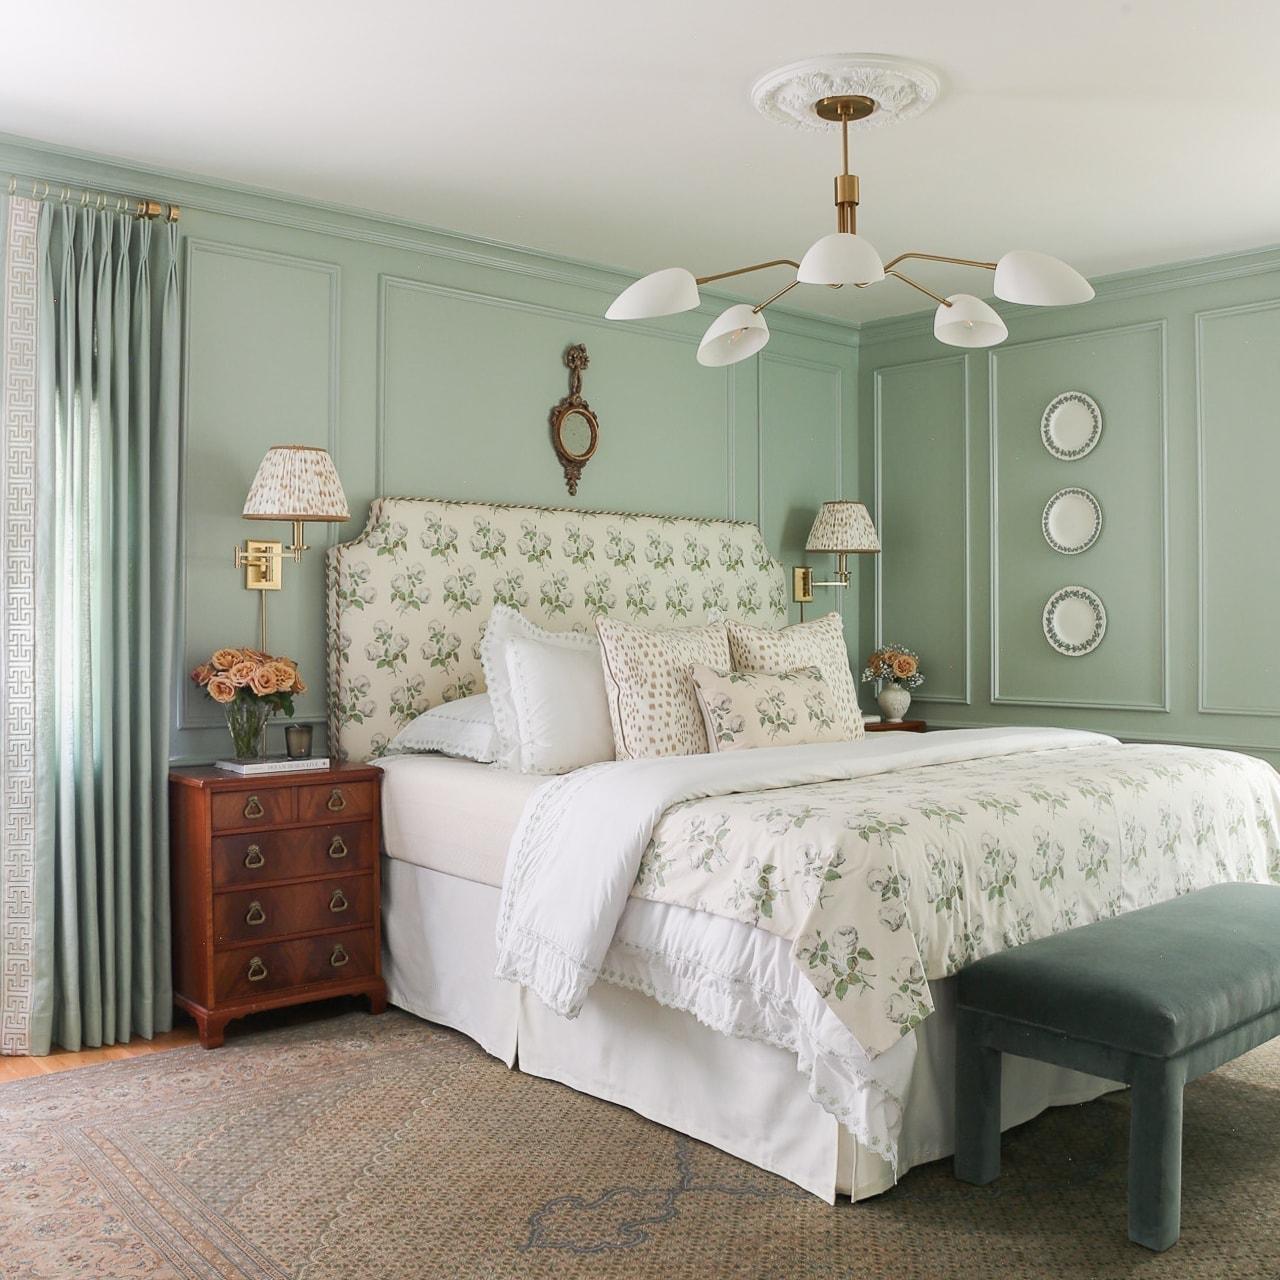 grandmillennial-style-bedroom